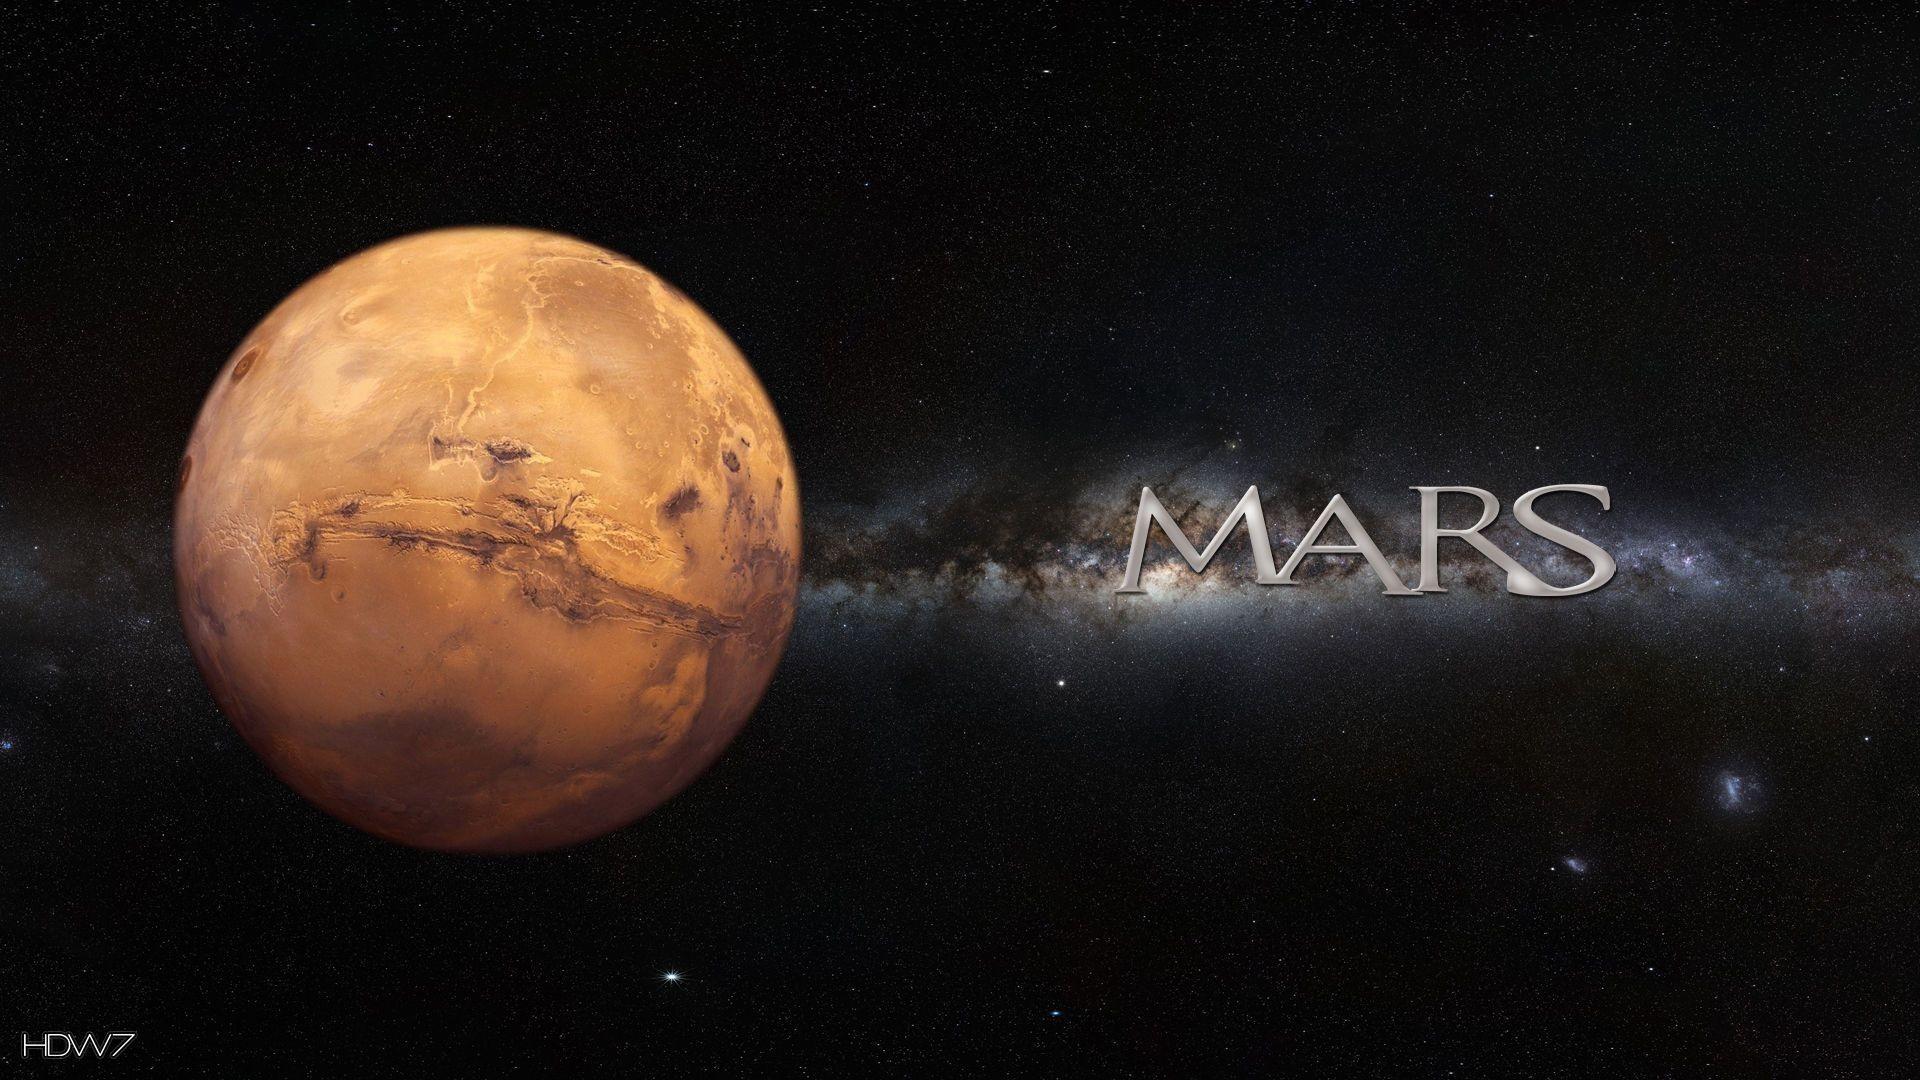 Res: 1920x1080, Mars Planet HD Wallpapers, Desktop Backgrounds, Mobile Wallpapers 1920×1080 Mars  Wallpapers (